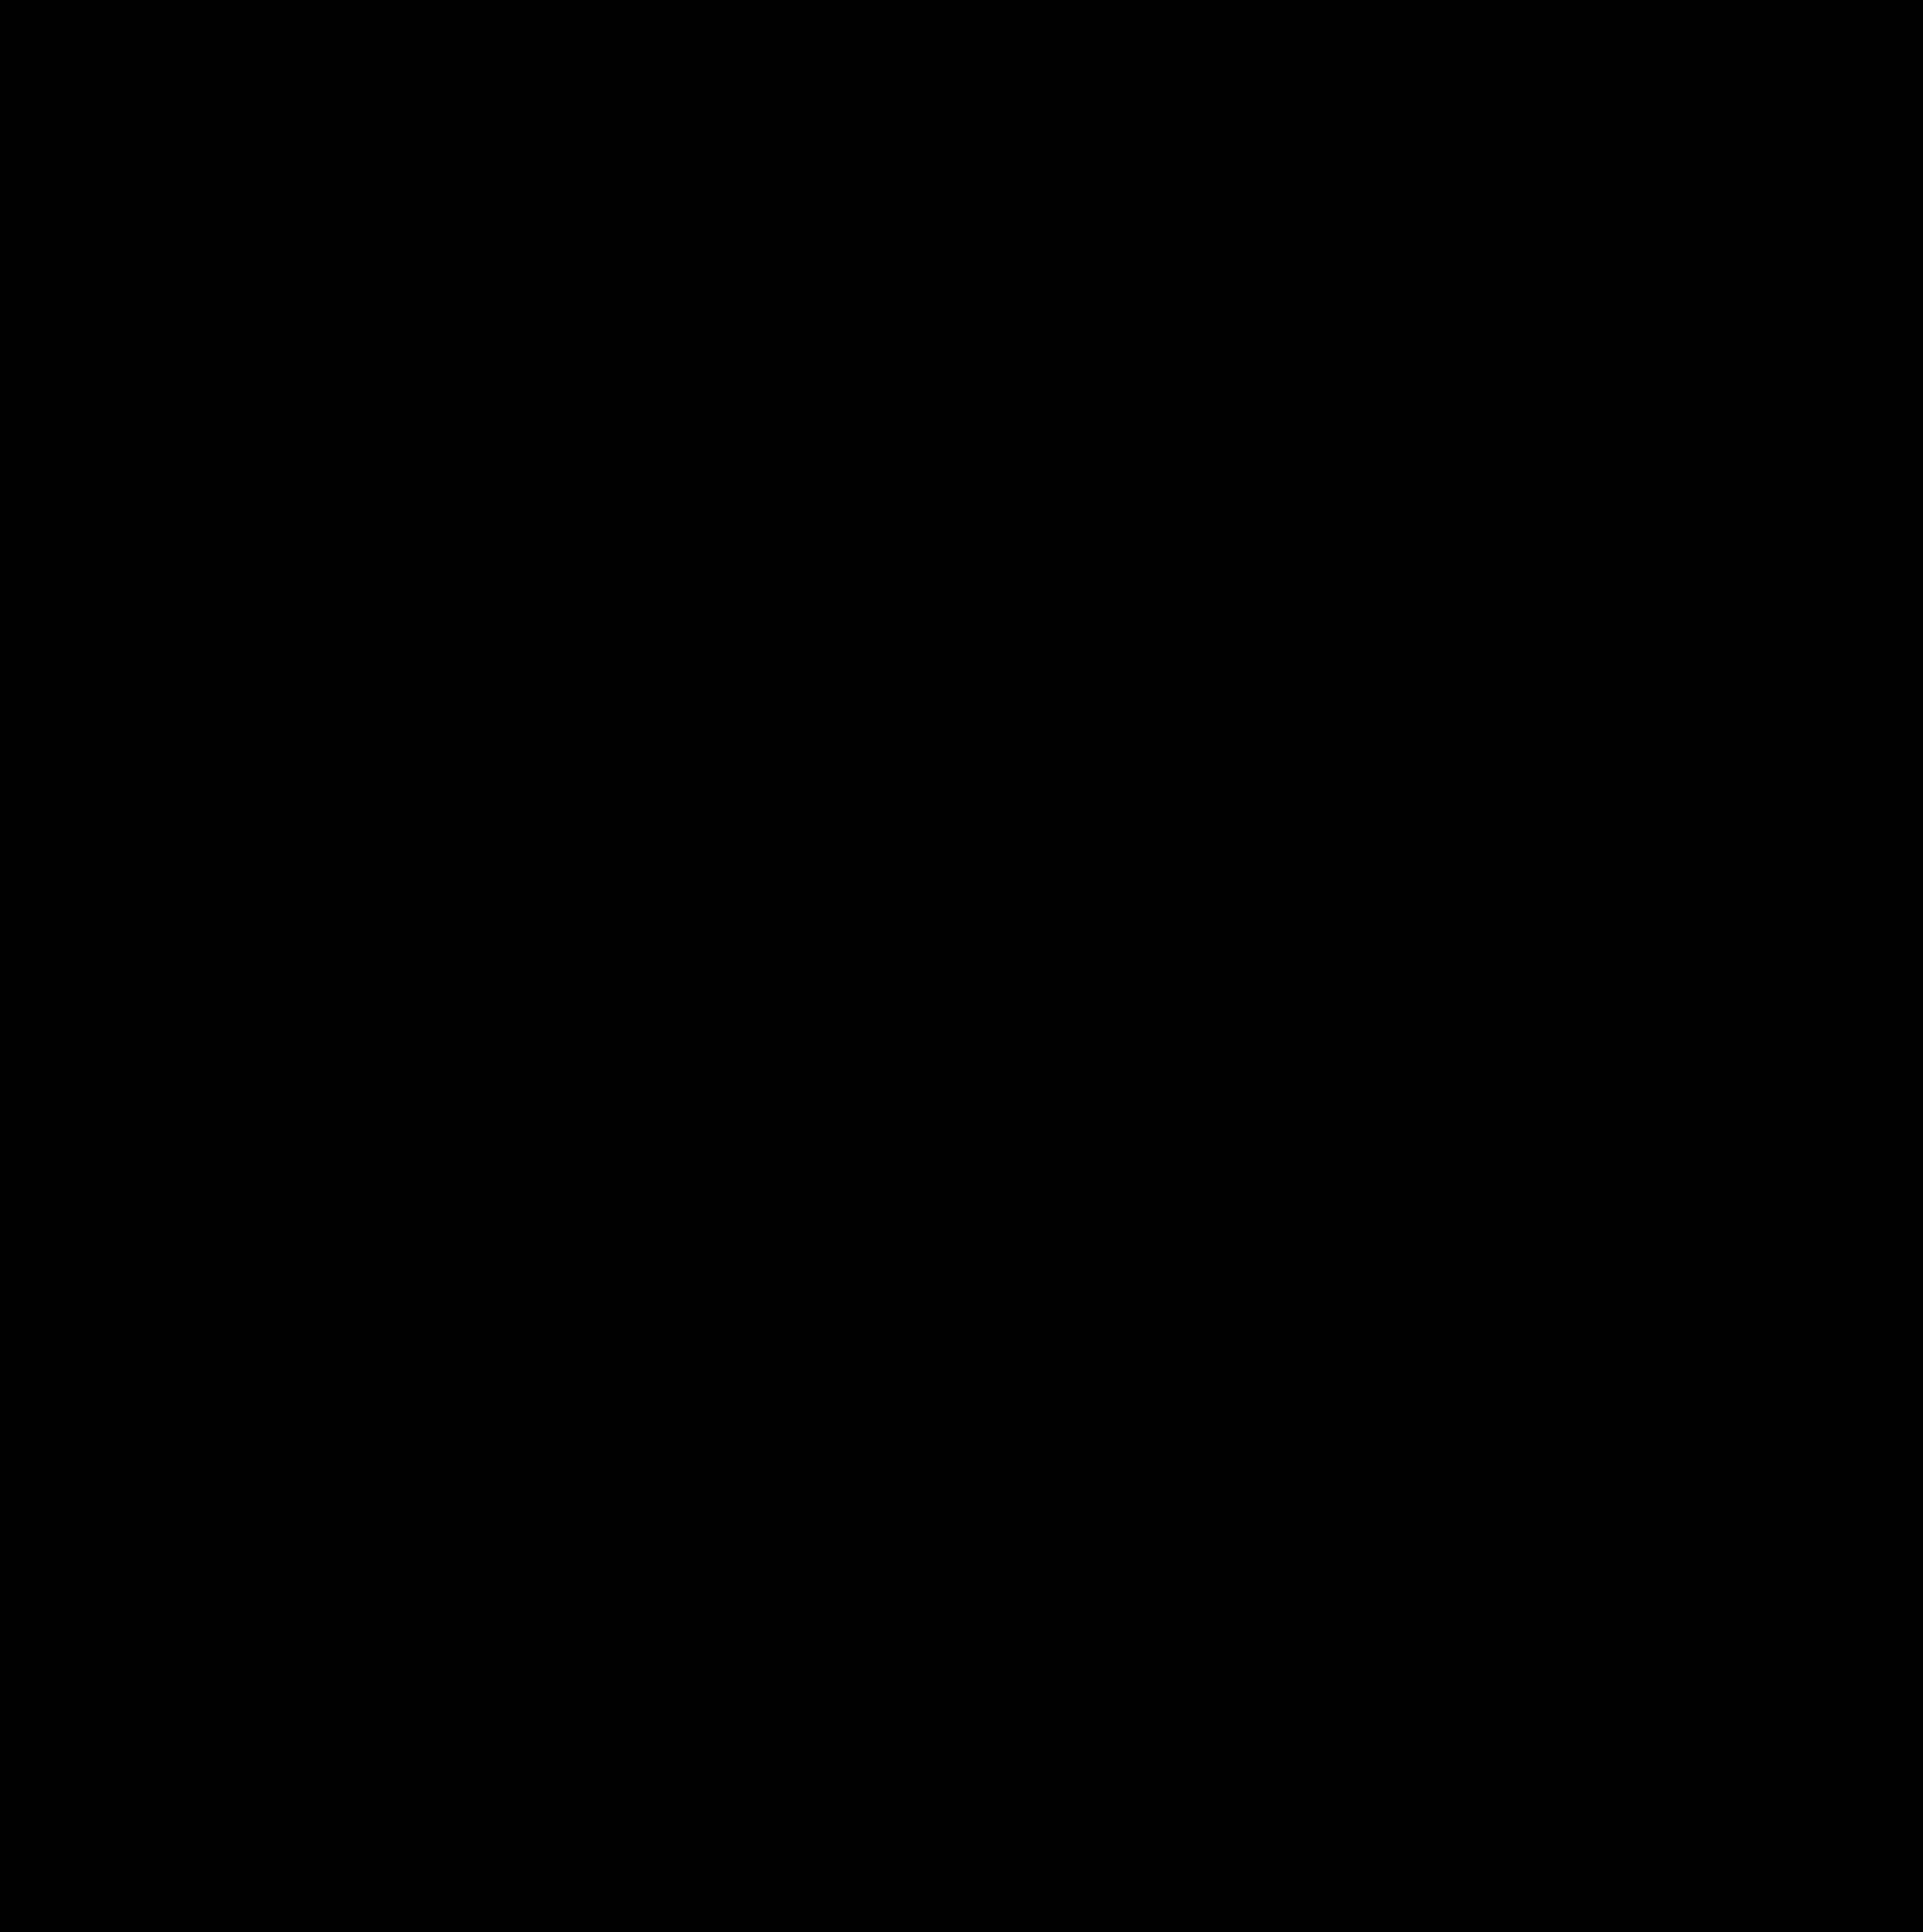 source/images/posts/2020-05-24-heyalter/heyalter_logo.png